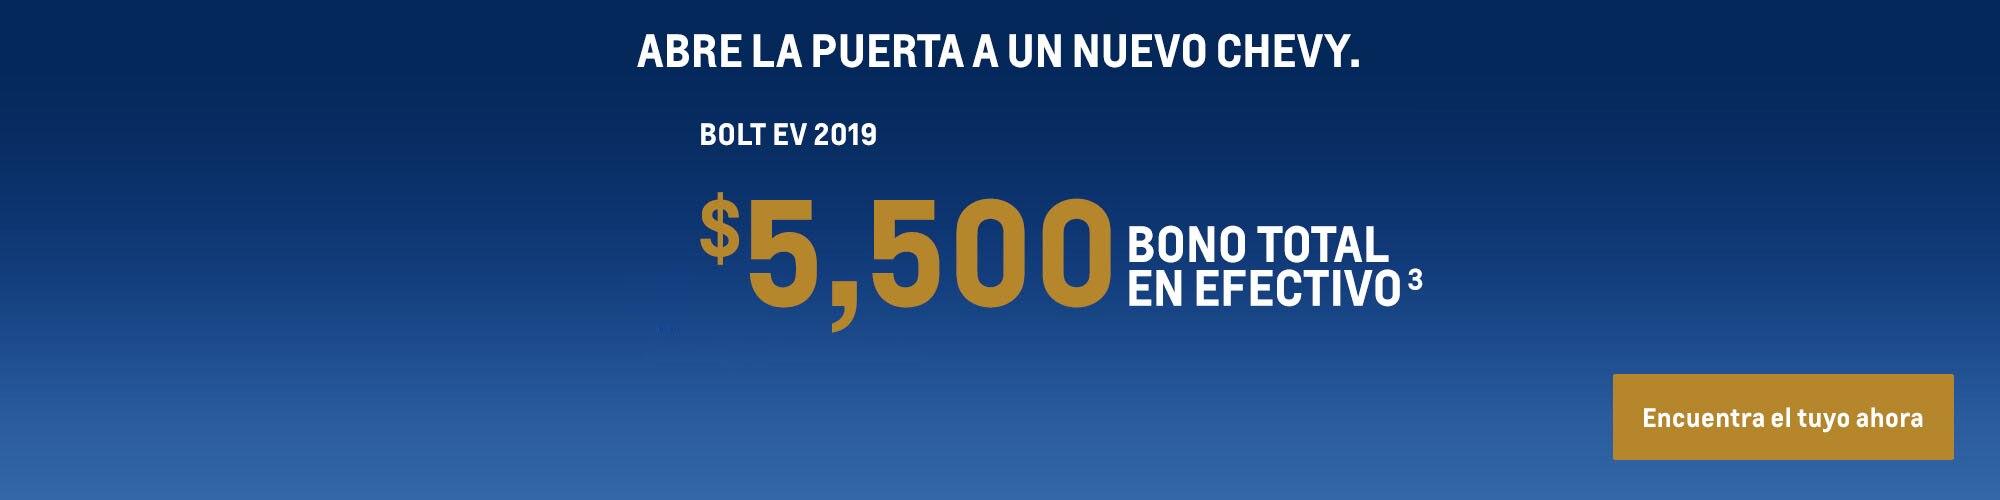 Bolt EV 2019: $5,500 Bono total en efectivo